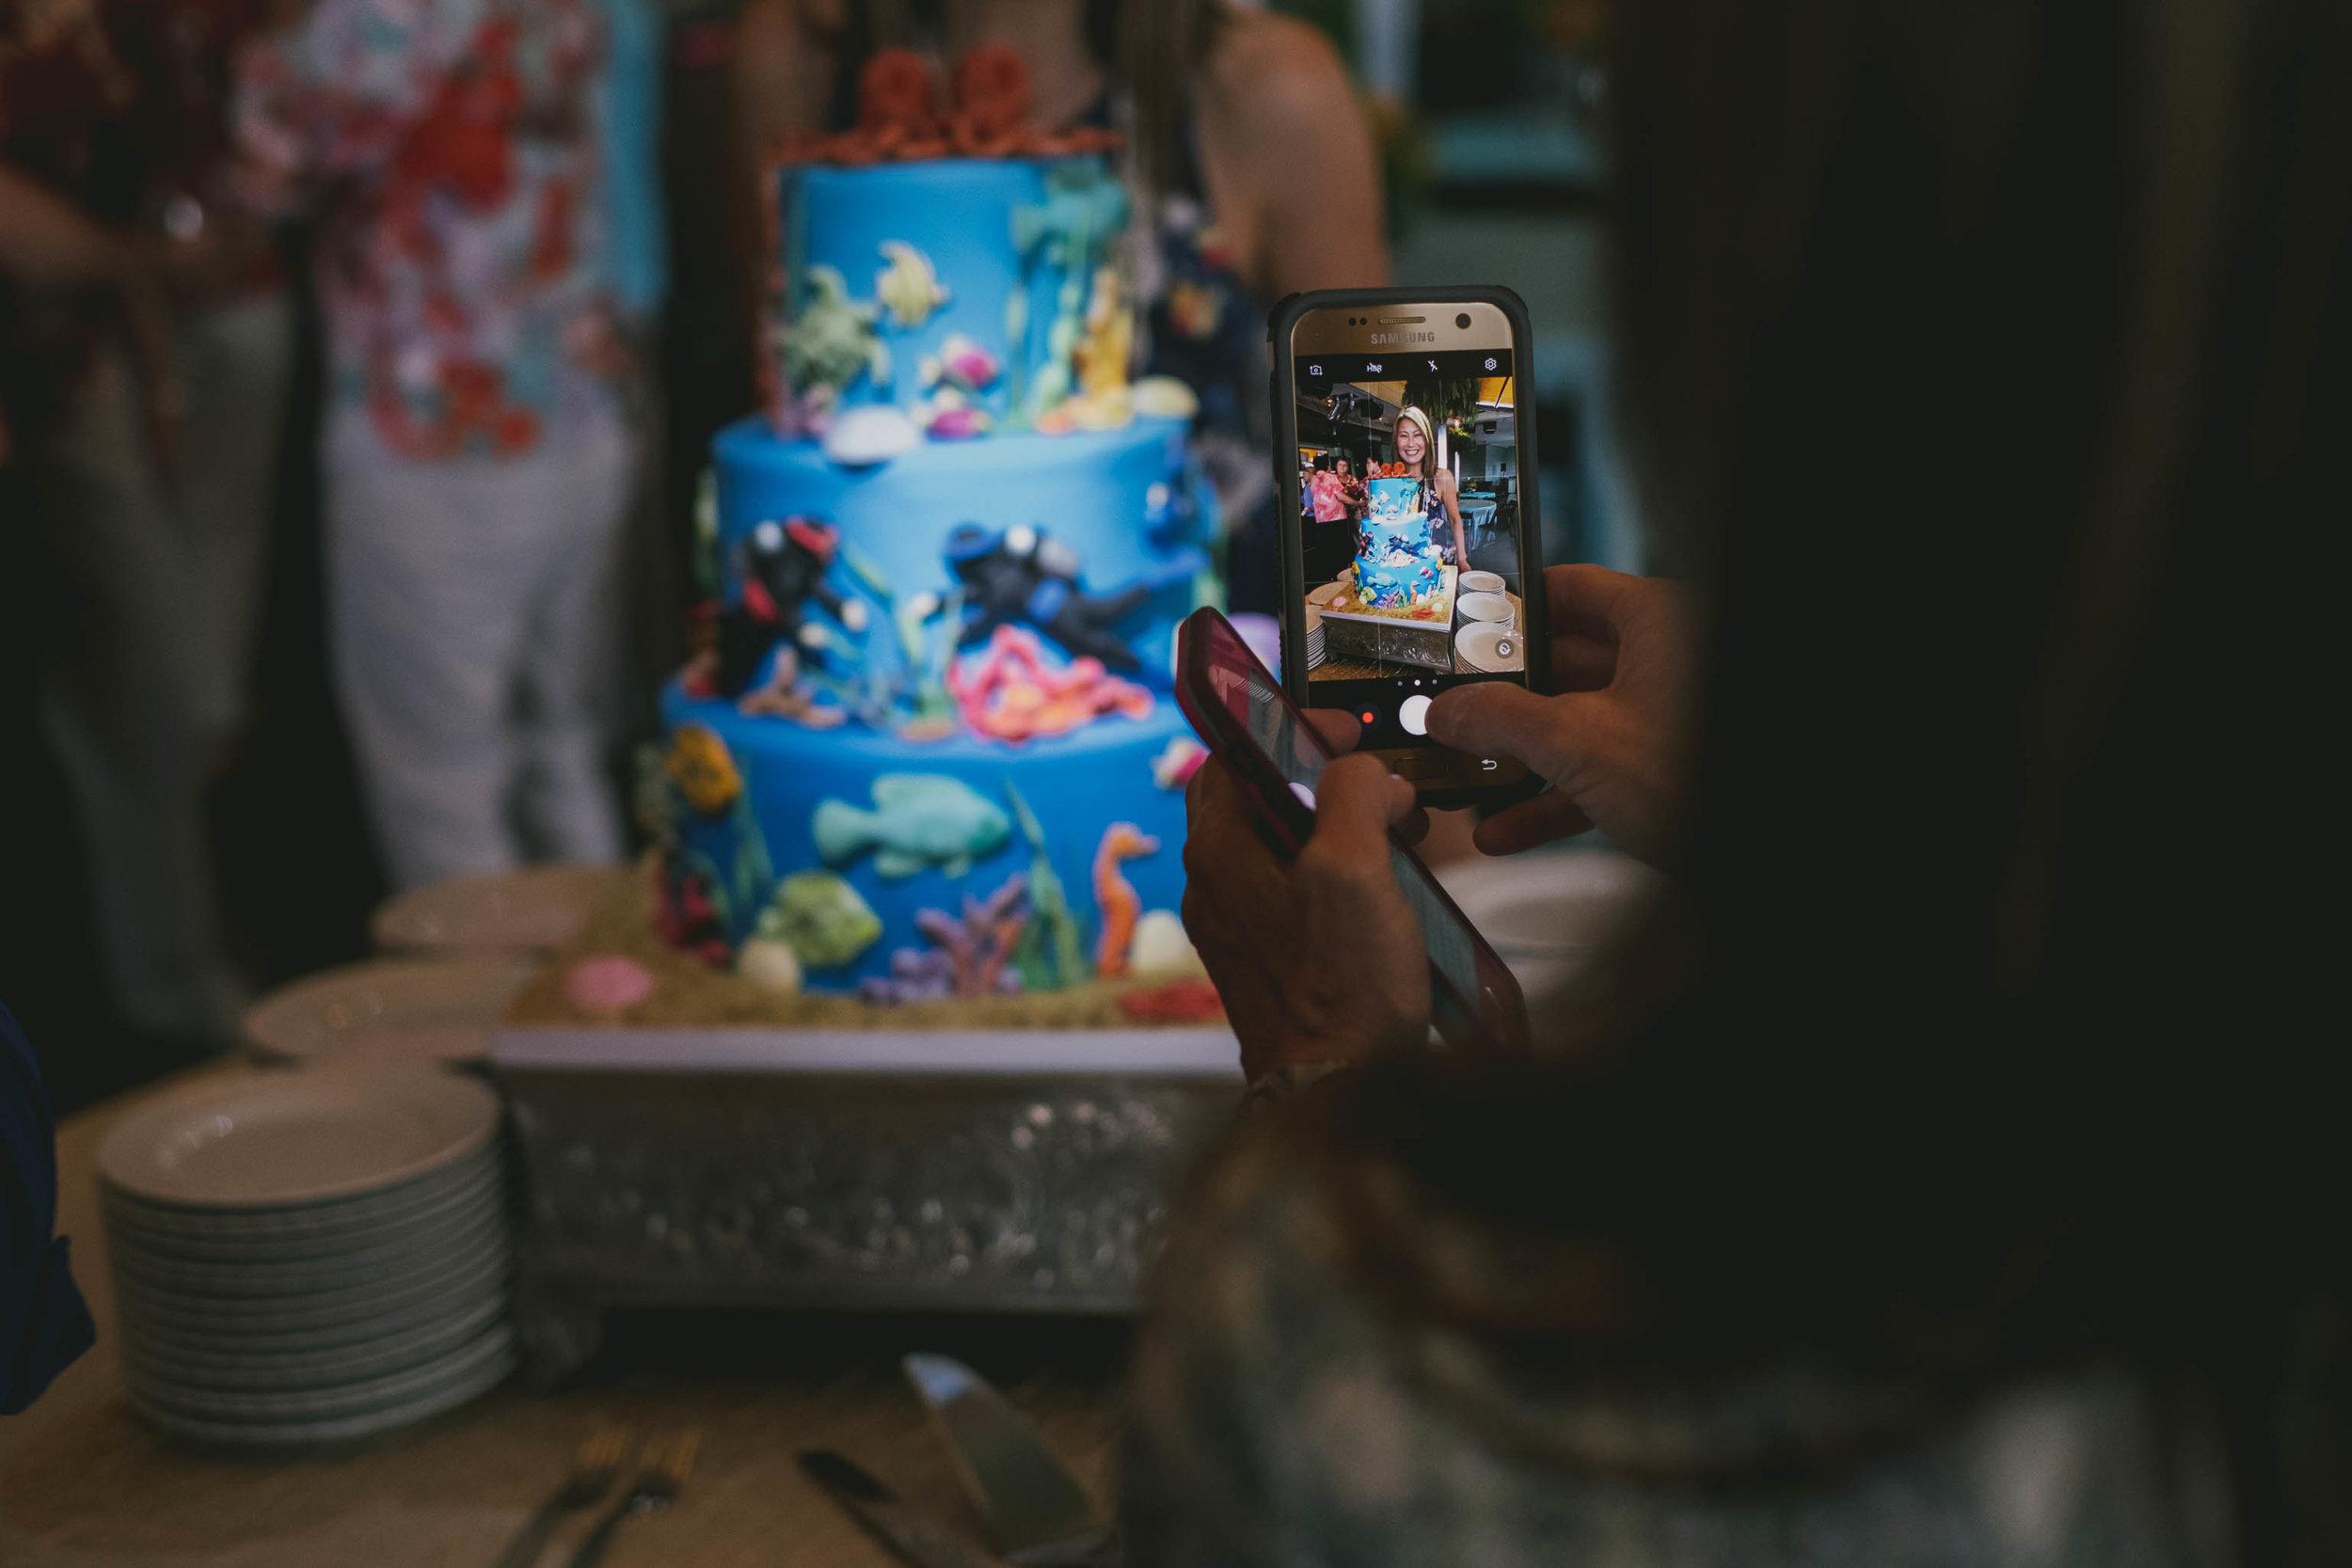 solas-restaurant-raleigh-same-sex-wedding-cake-detail-photo.jpg